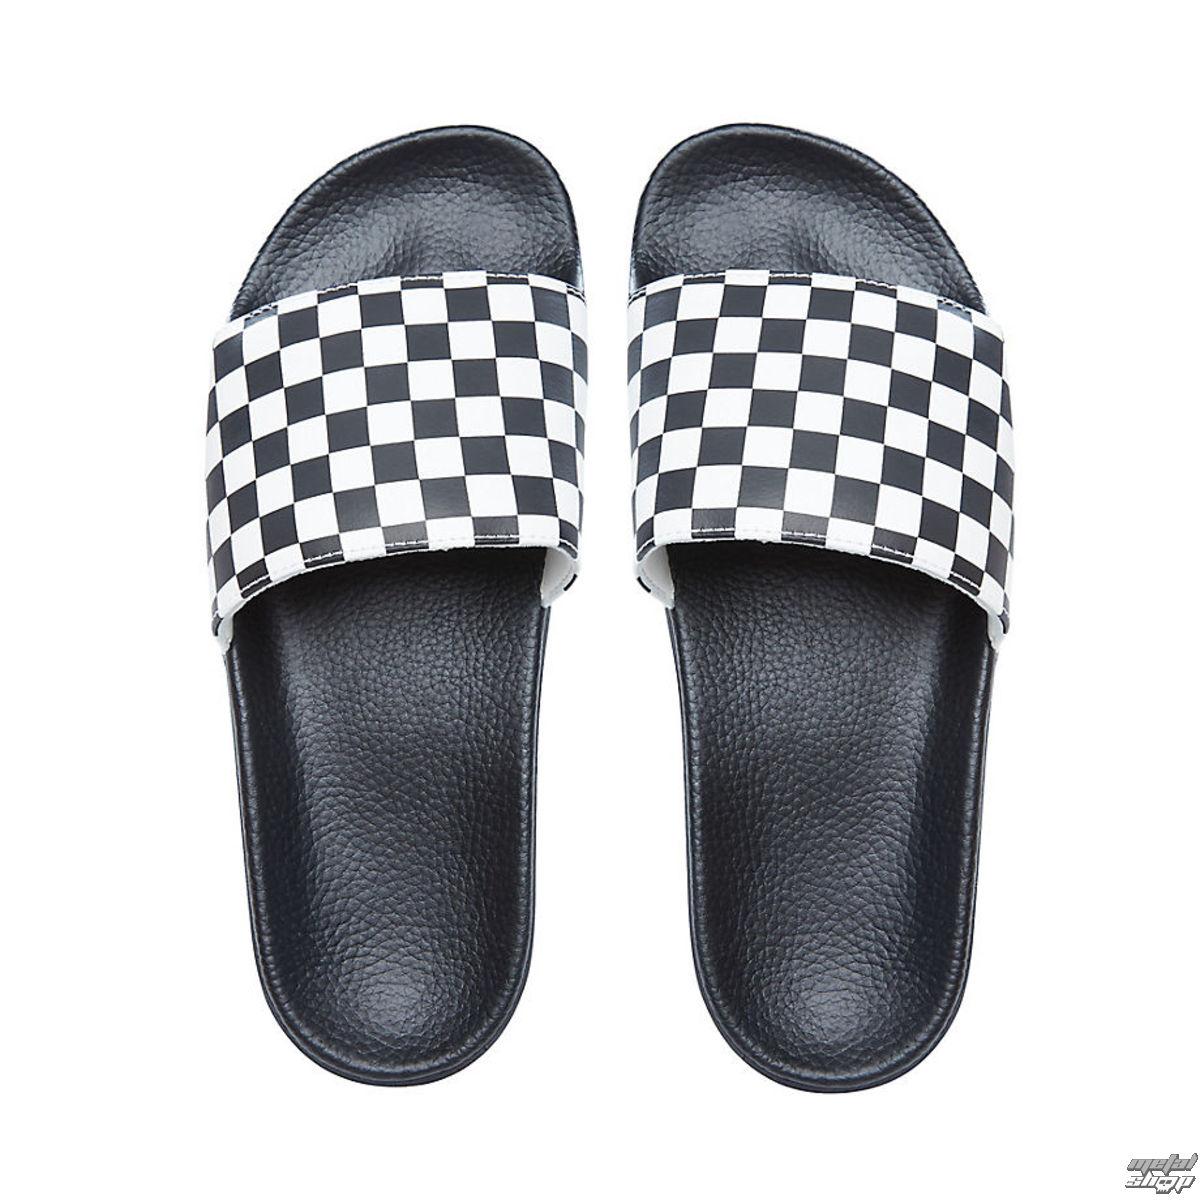 Slide OnCheckerboardBlack V4KIIP9 men sandals White VANS uJTFK3l1c